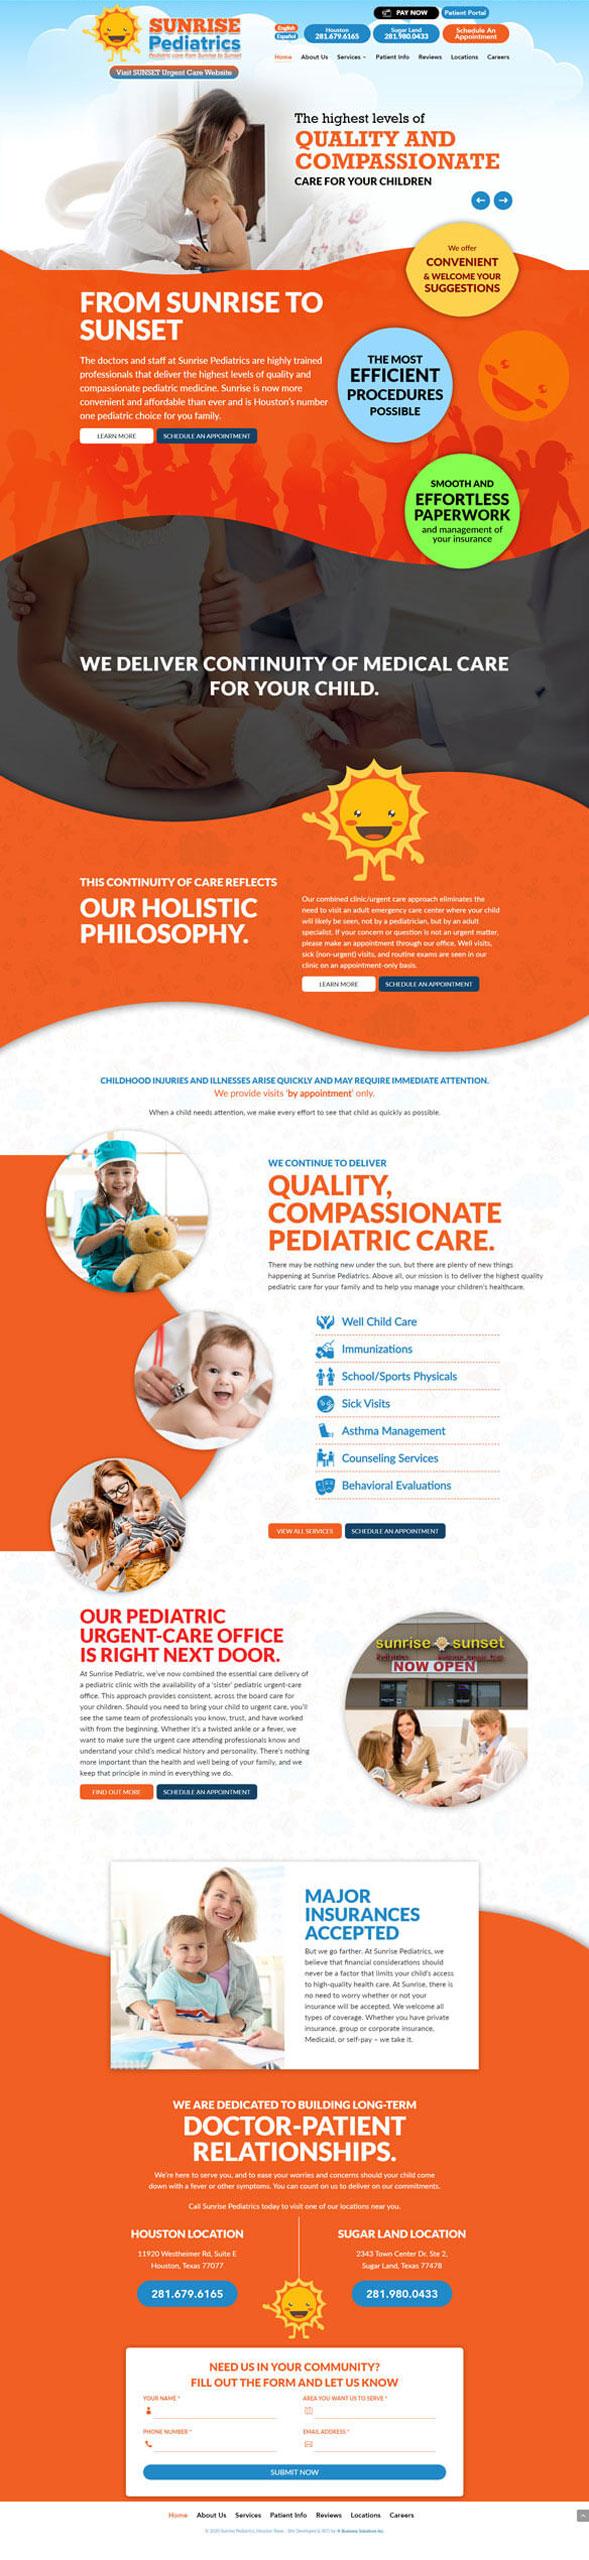 Sunset Pediatrics